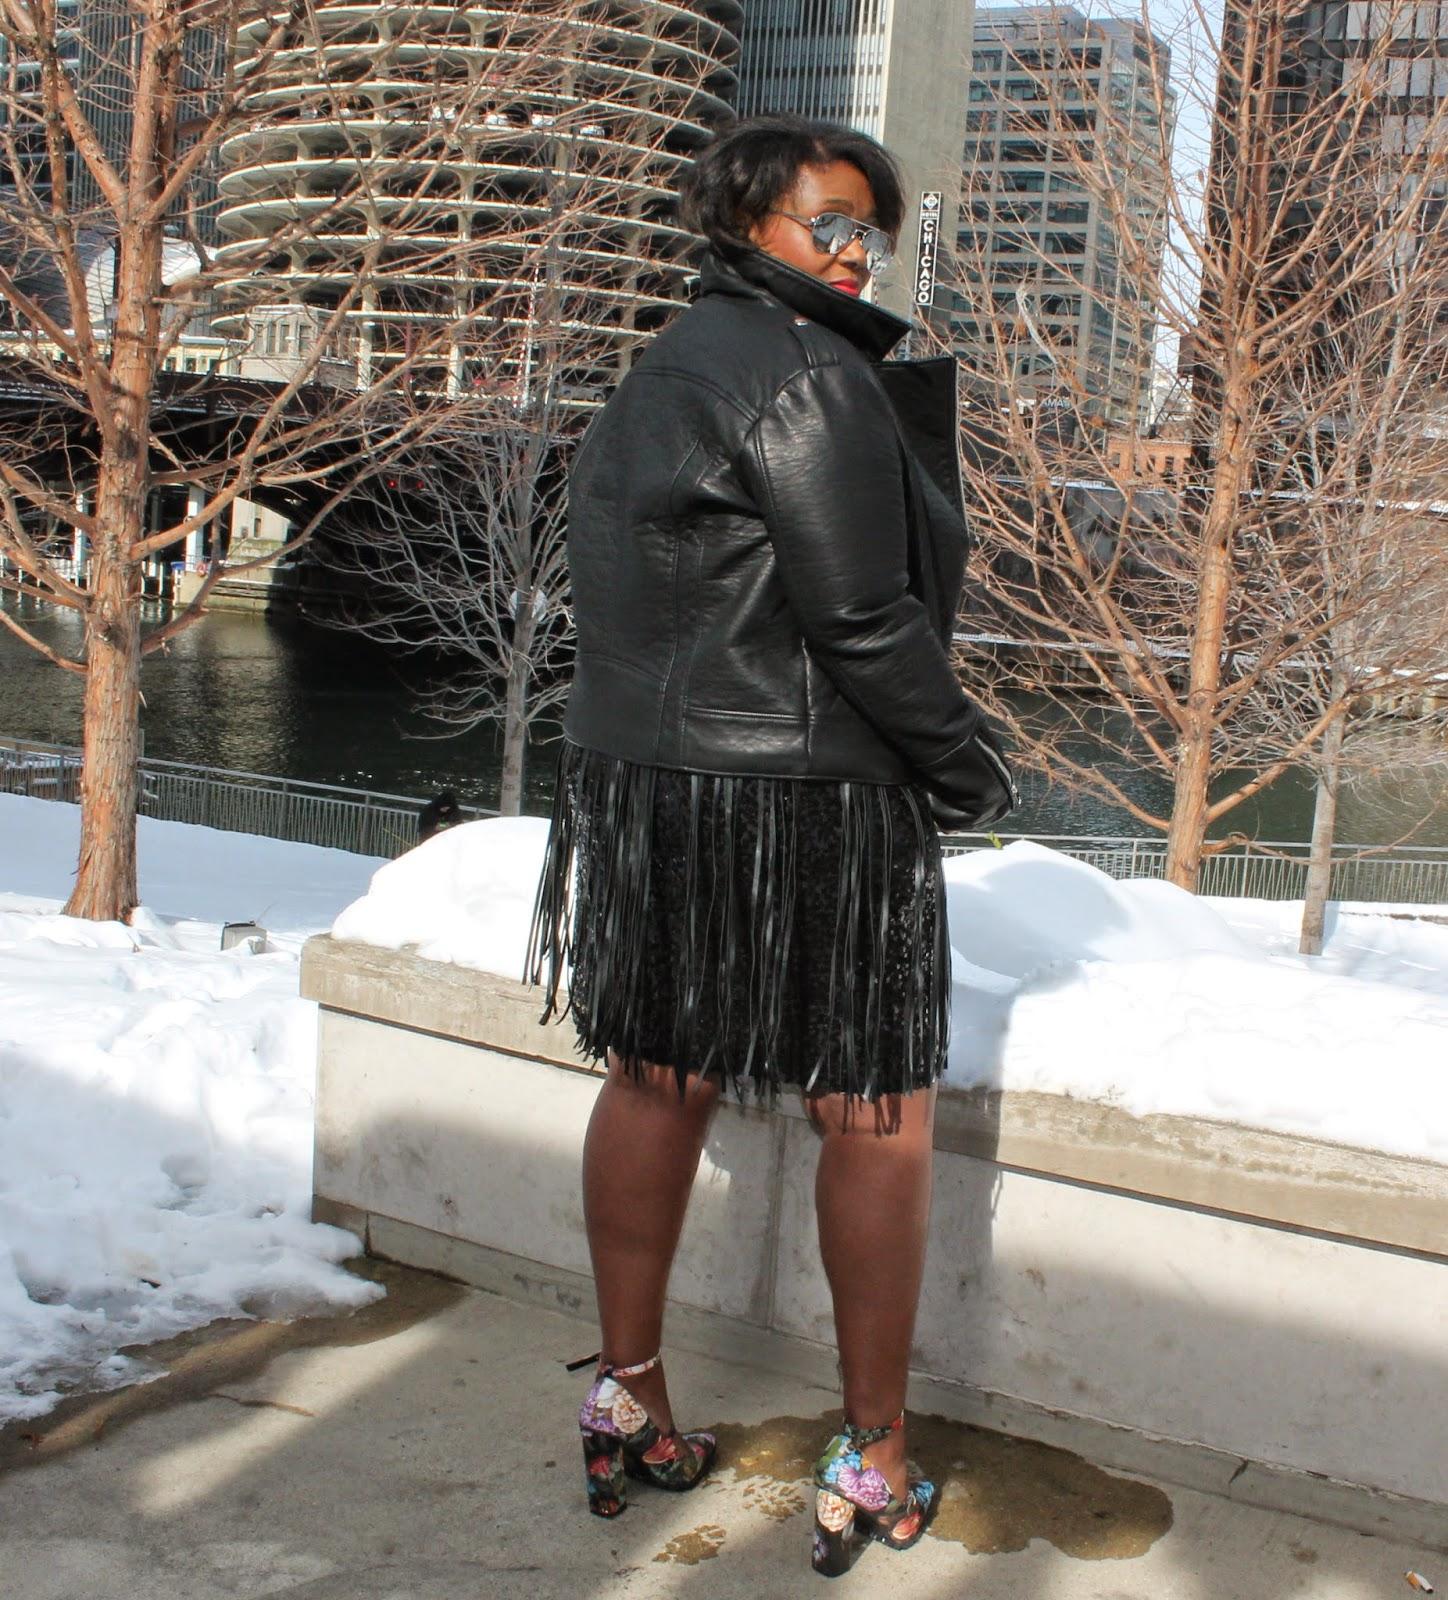 Valentines Day Style Rocker Chic leather Jacket Plus Size Sequins Fringe Floral Block Heel Pump